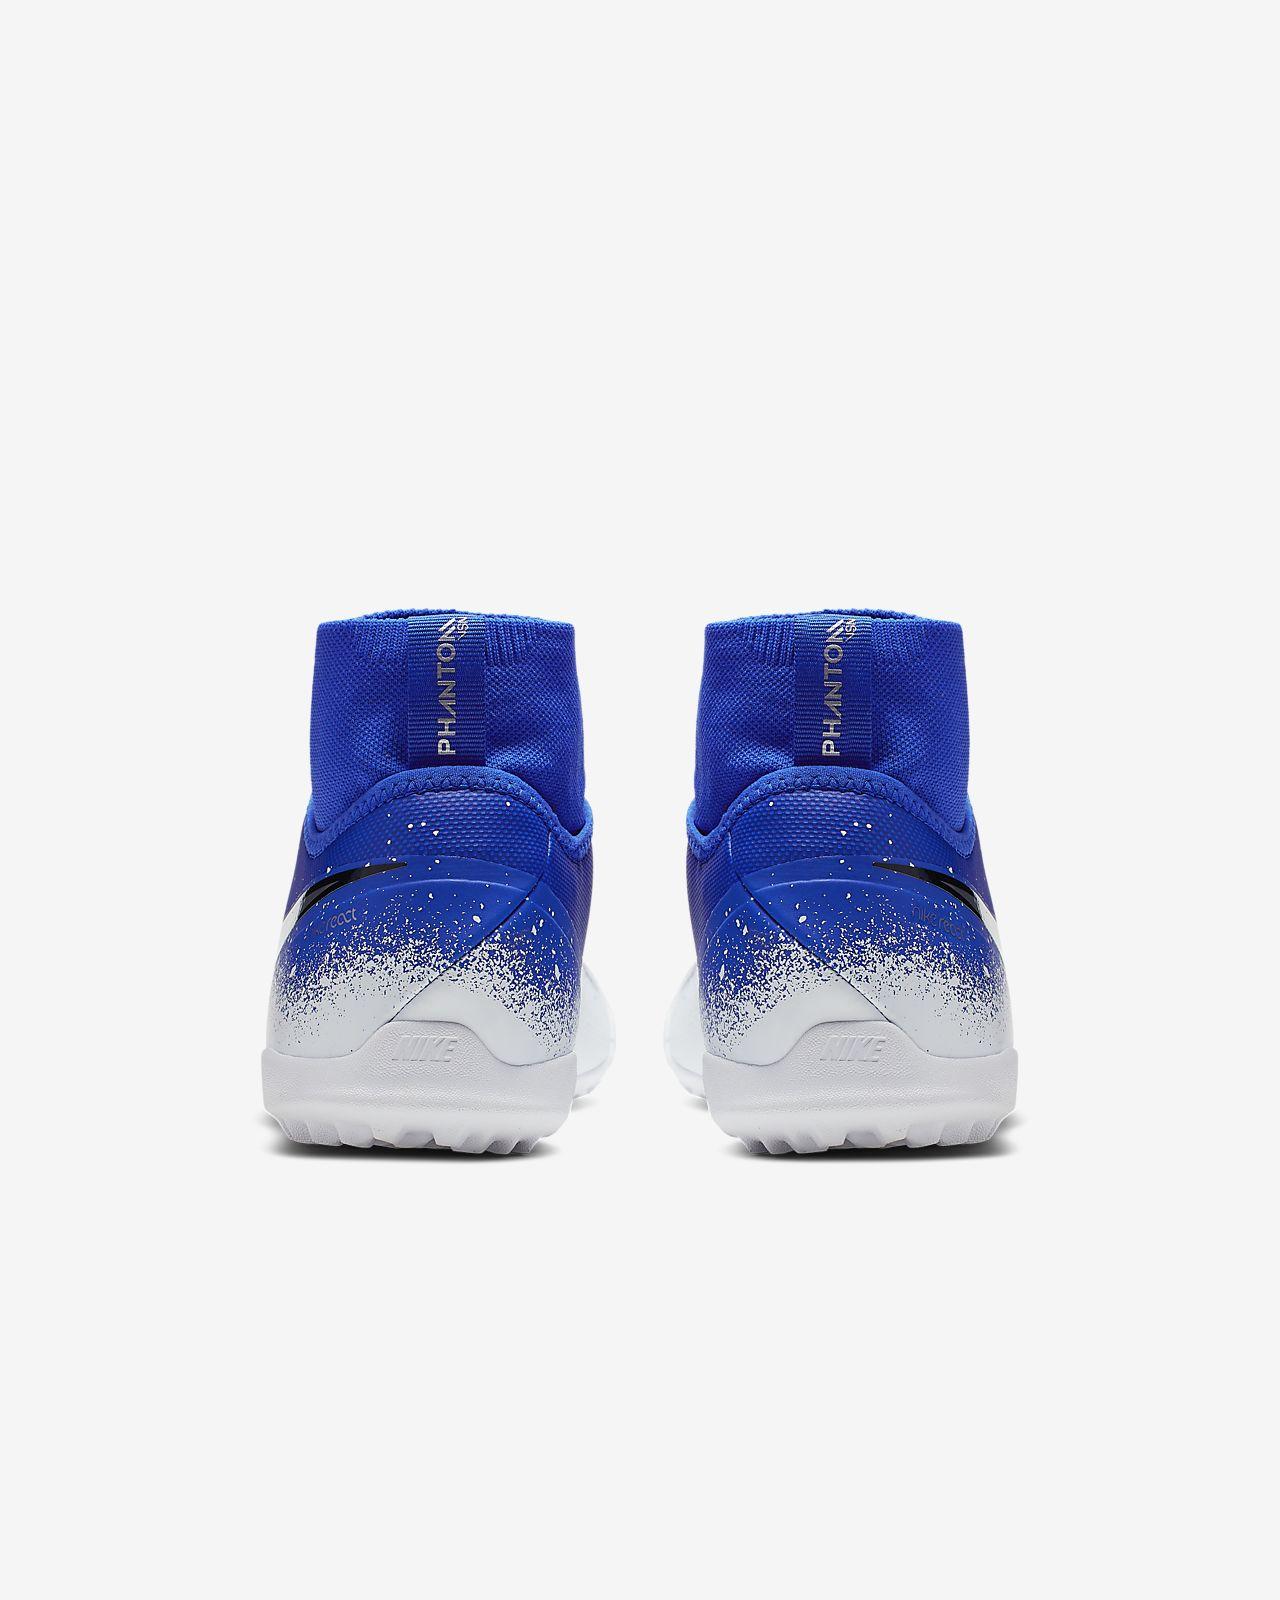 sale retailer dfbfc d8982 ... Fotbollssko för grus turf Nike React Phantom Vision Pro Dynamic Fit TF